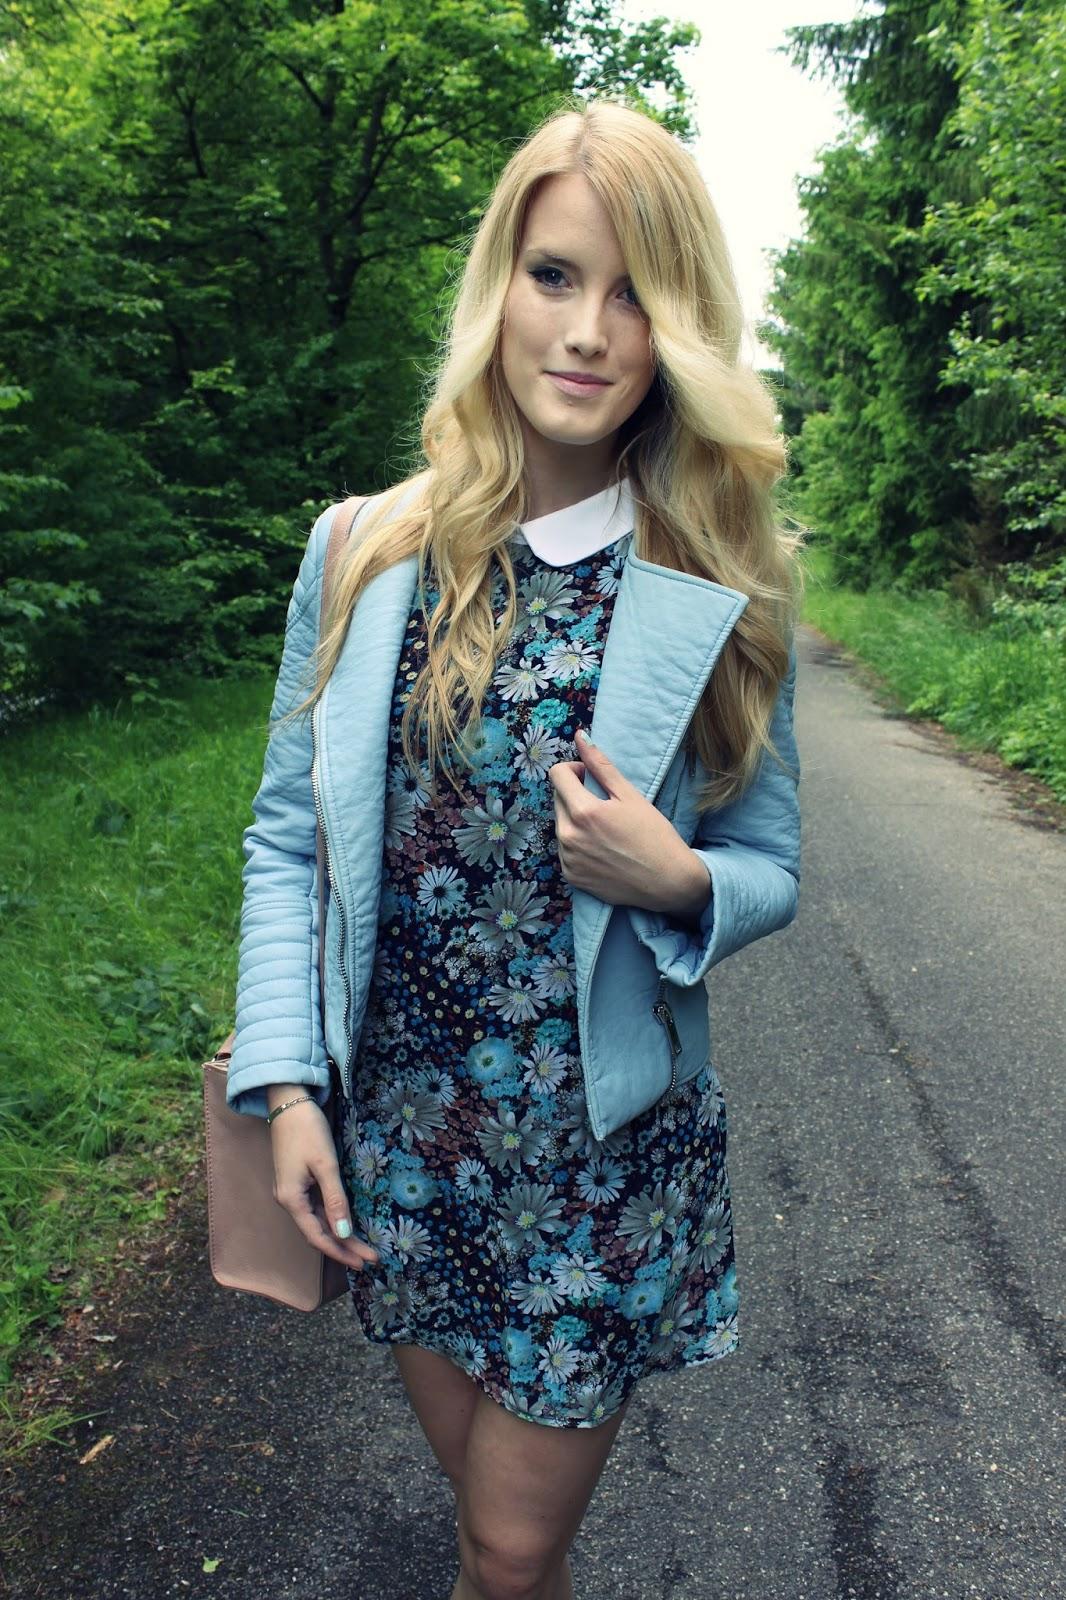 Flower Print Flowerprint dress WalG TheBlondeLion Outfit babyblue Zara